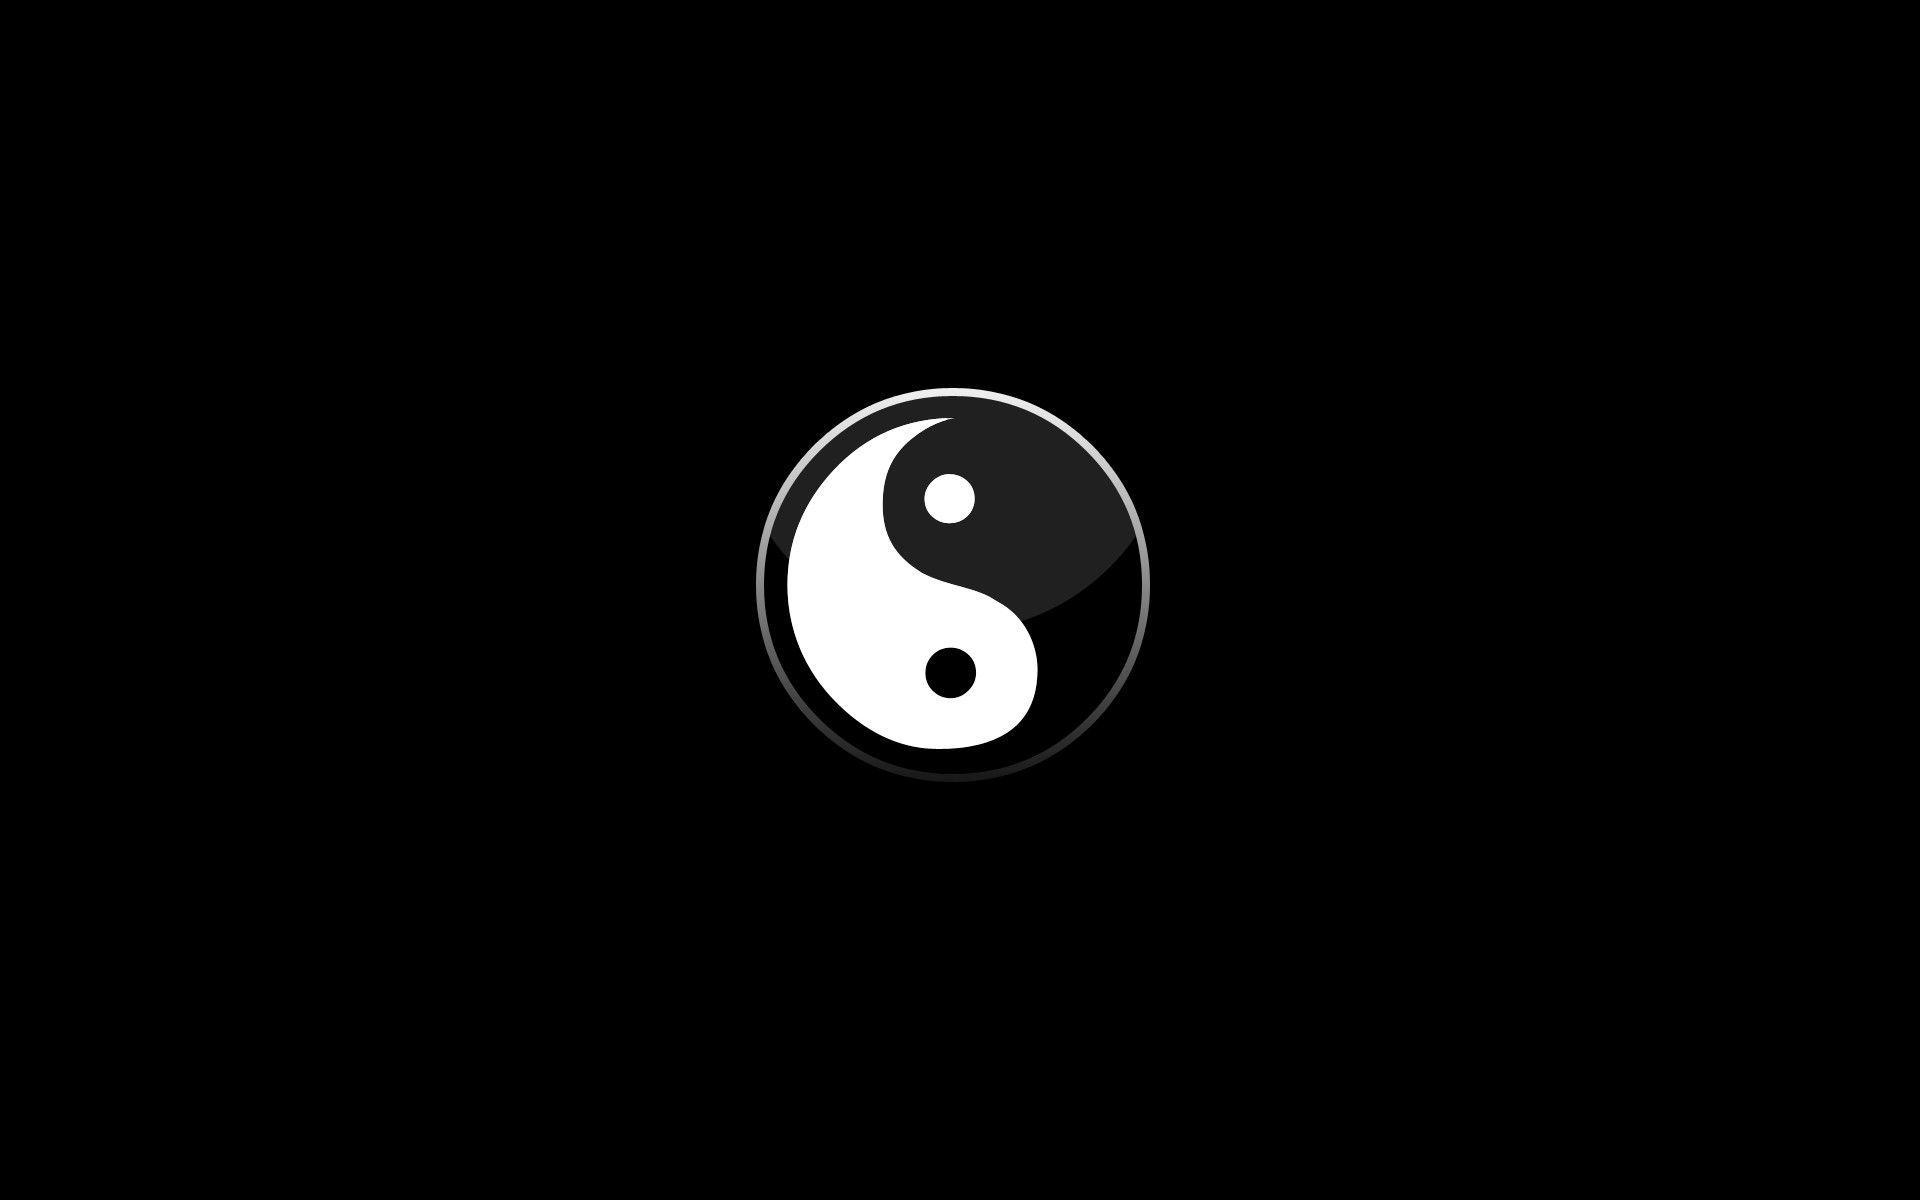 Yin And Yang Wallpapers Top Free Yin And Yang Backgrounds Wallpaperaccess